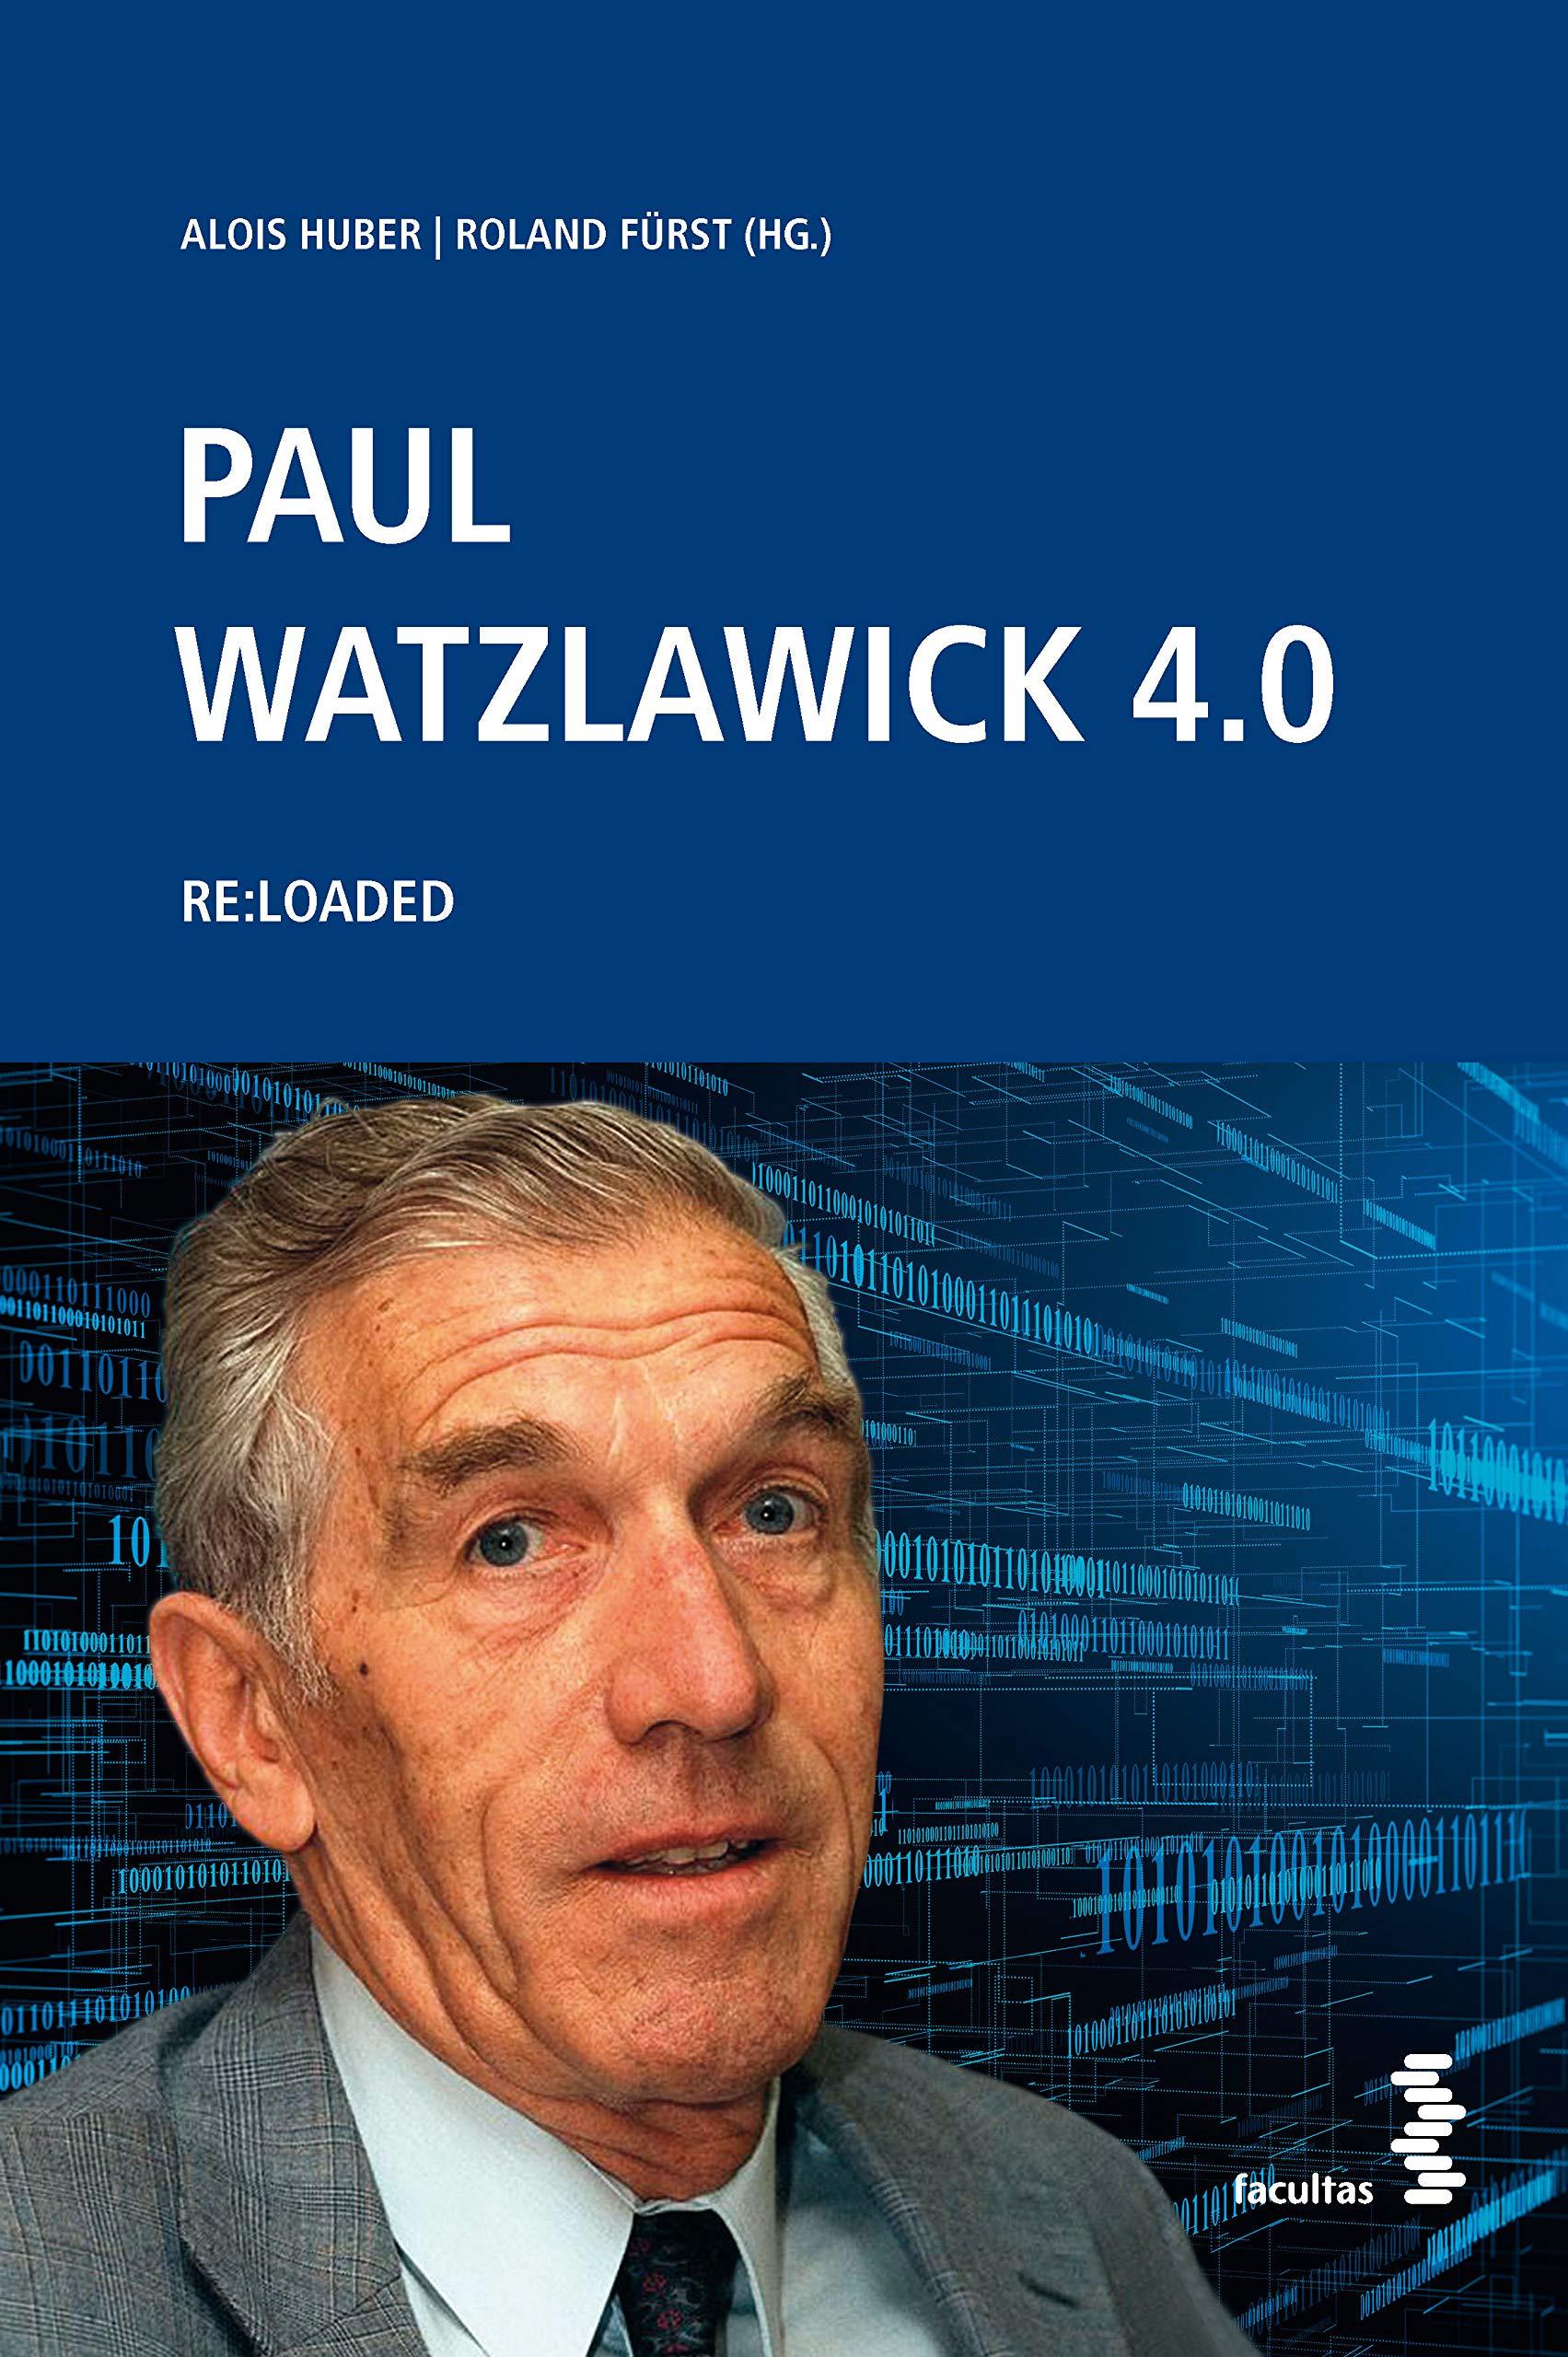 Paul Watzlawick 4.0: RE:LOADED